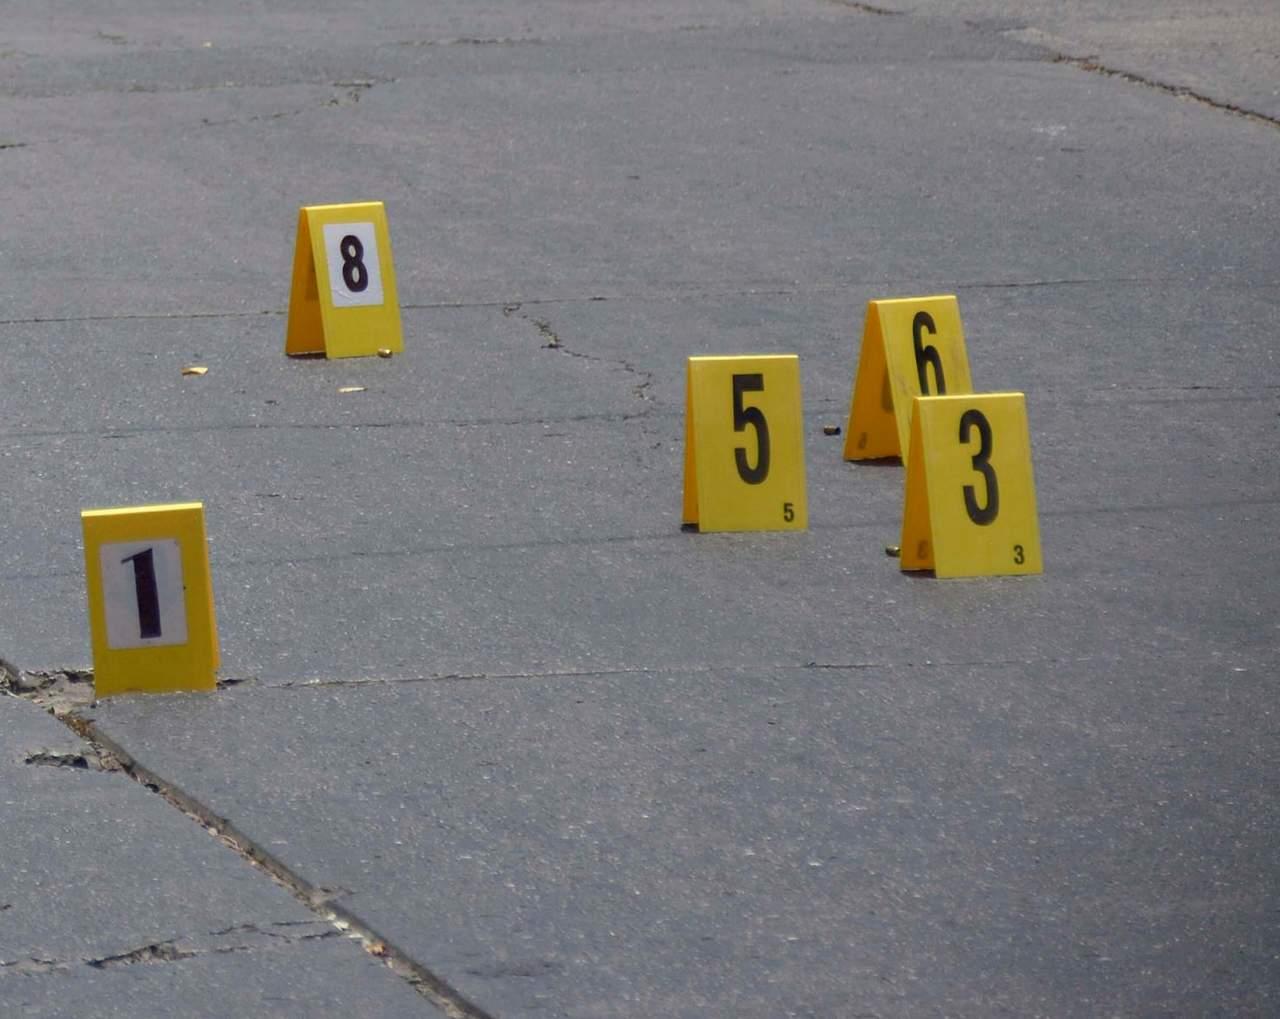 Asesinan a 21 personas en Guanajuato en menos de 30 horas